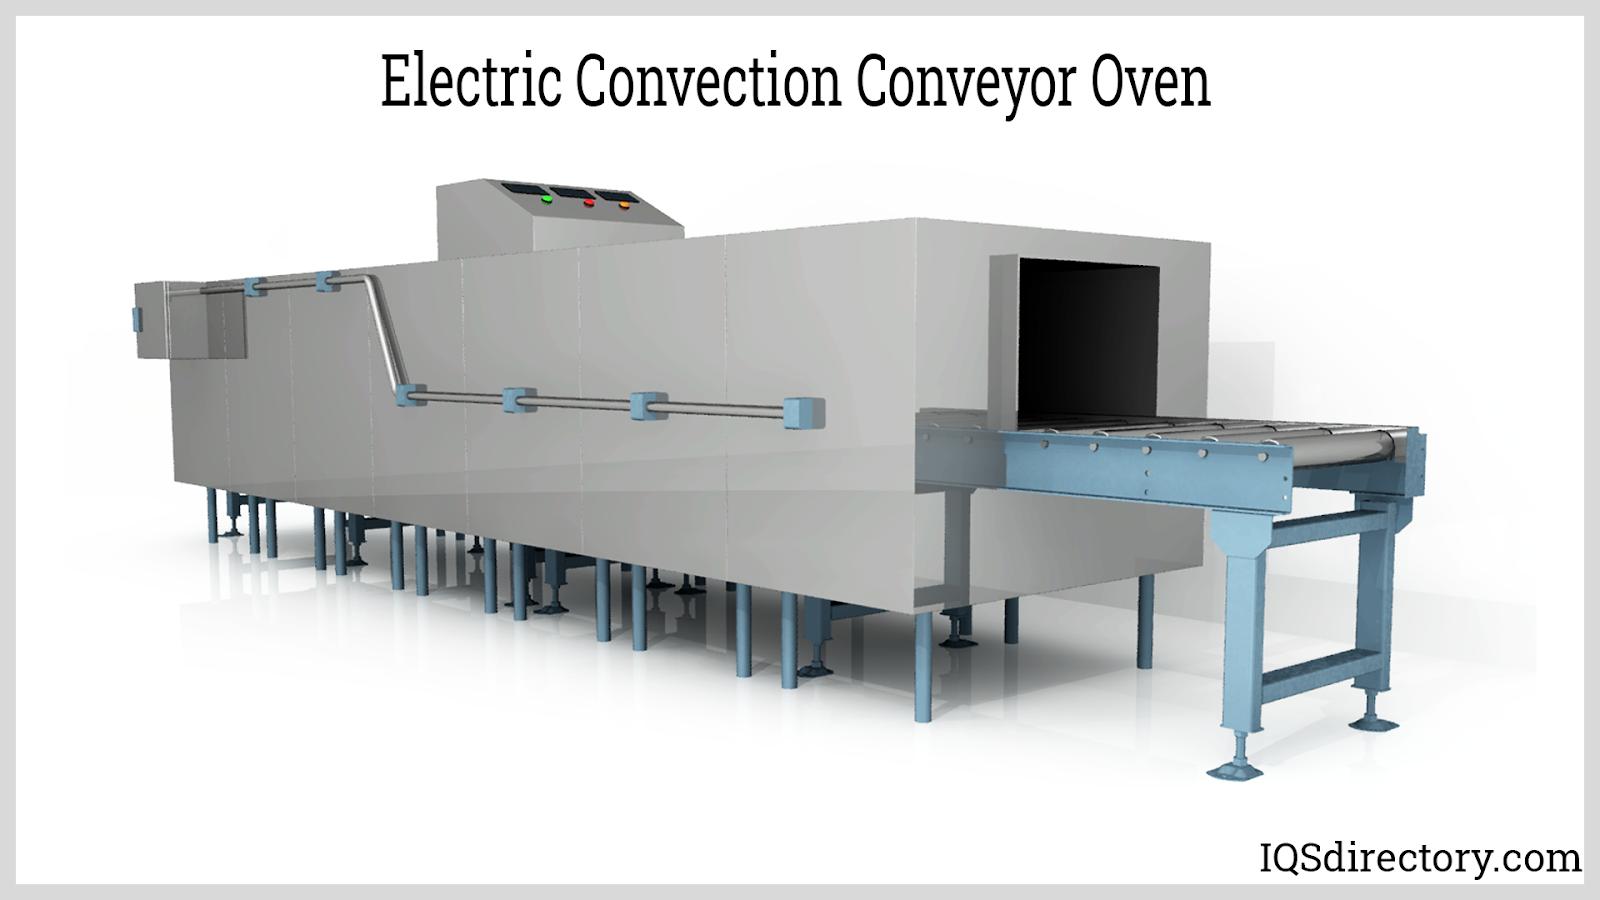 Electric Convection Conveyor Oven